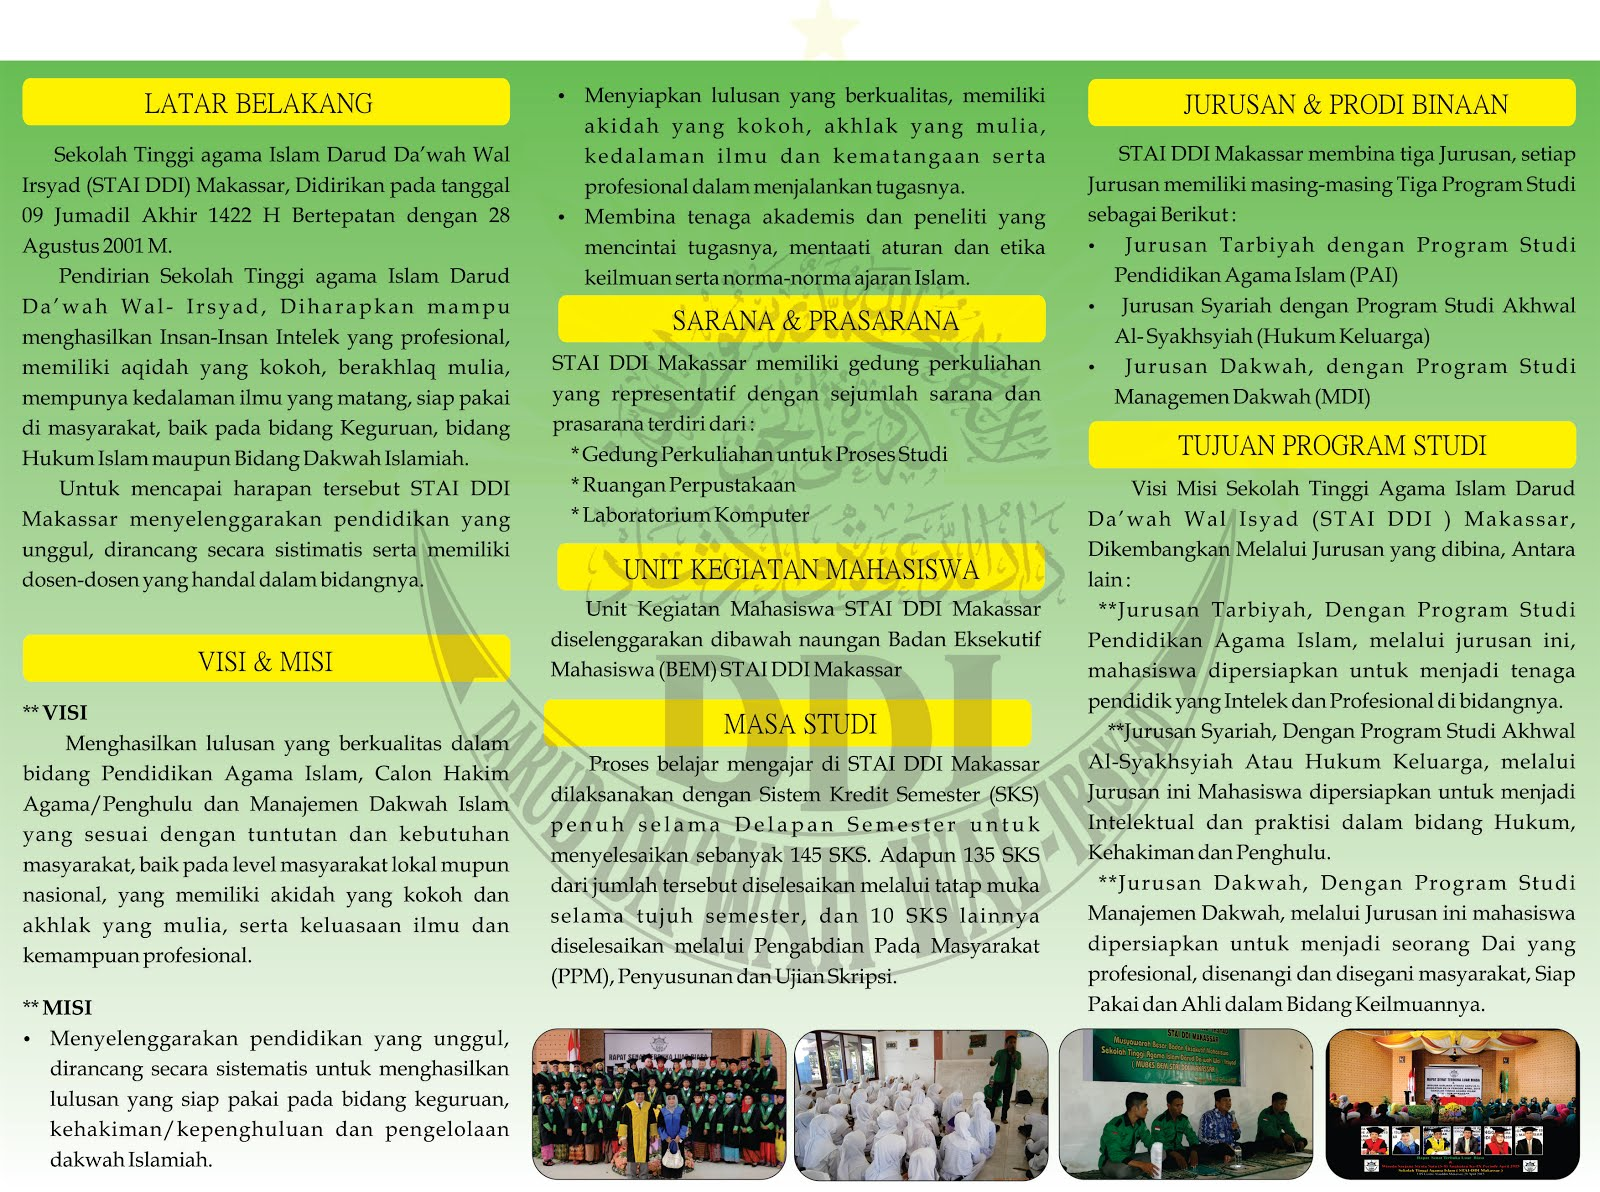 Akulturasi Antara Tradisi Lokal Hindu Budha Dan Islam Di Indonesia